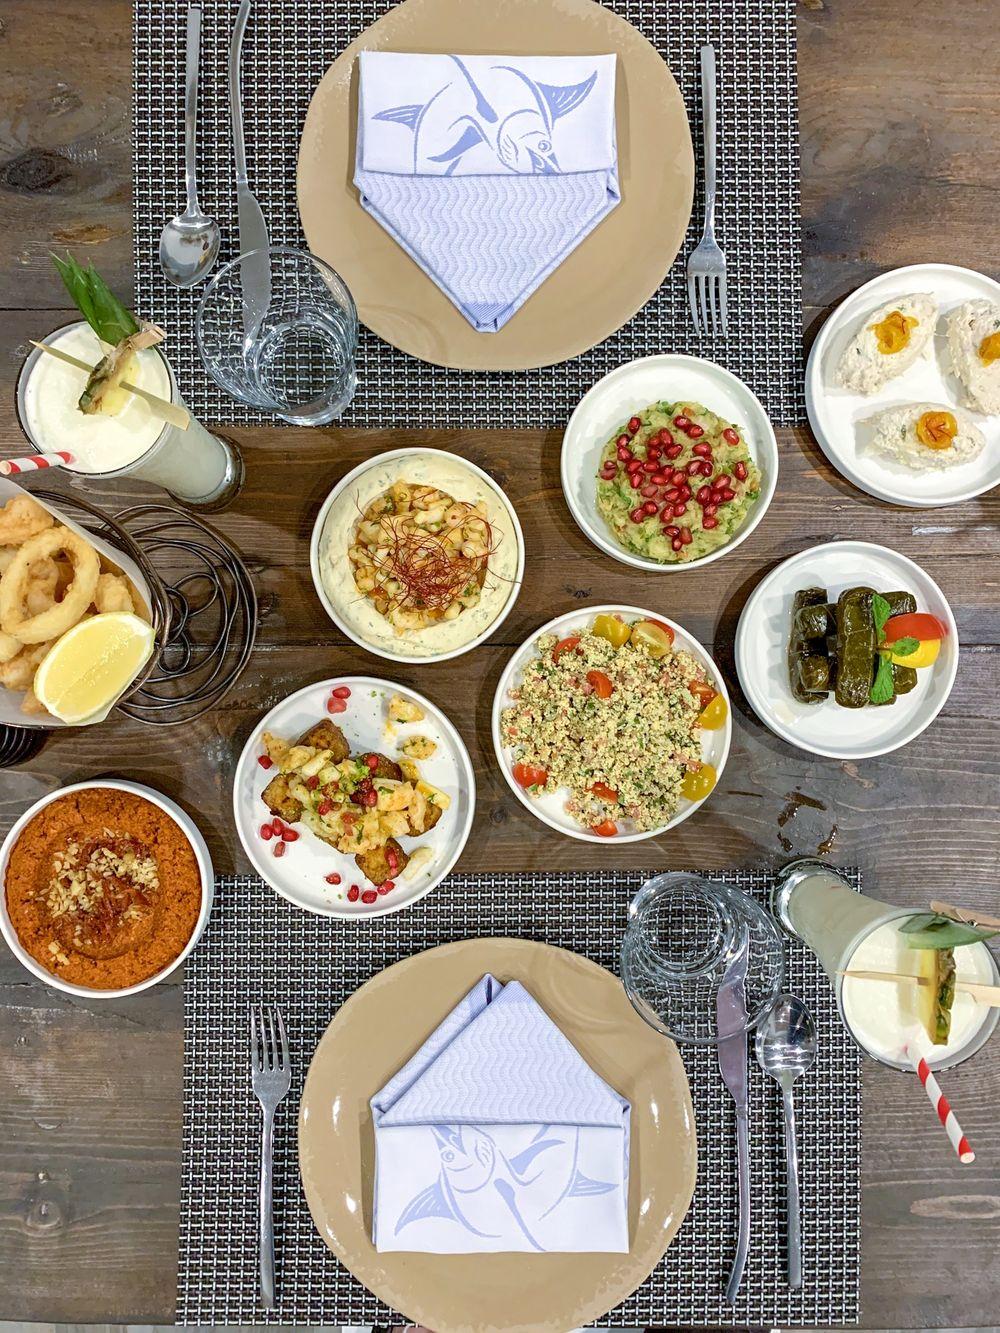 zaya-nurai-restaurants-island-abu-dhabi-nogarlicnoonions-5482019-05-14-10-19-29